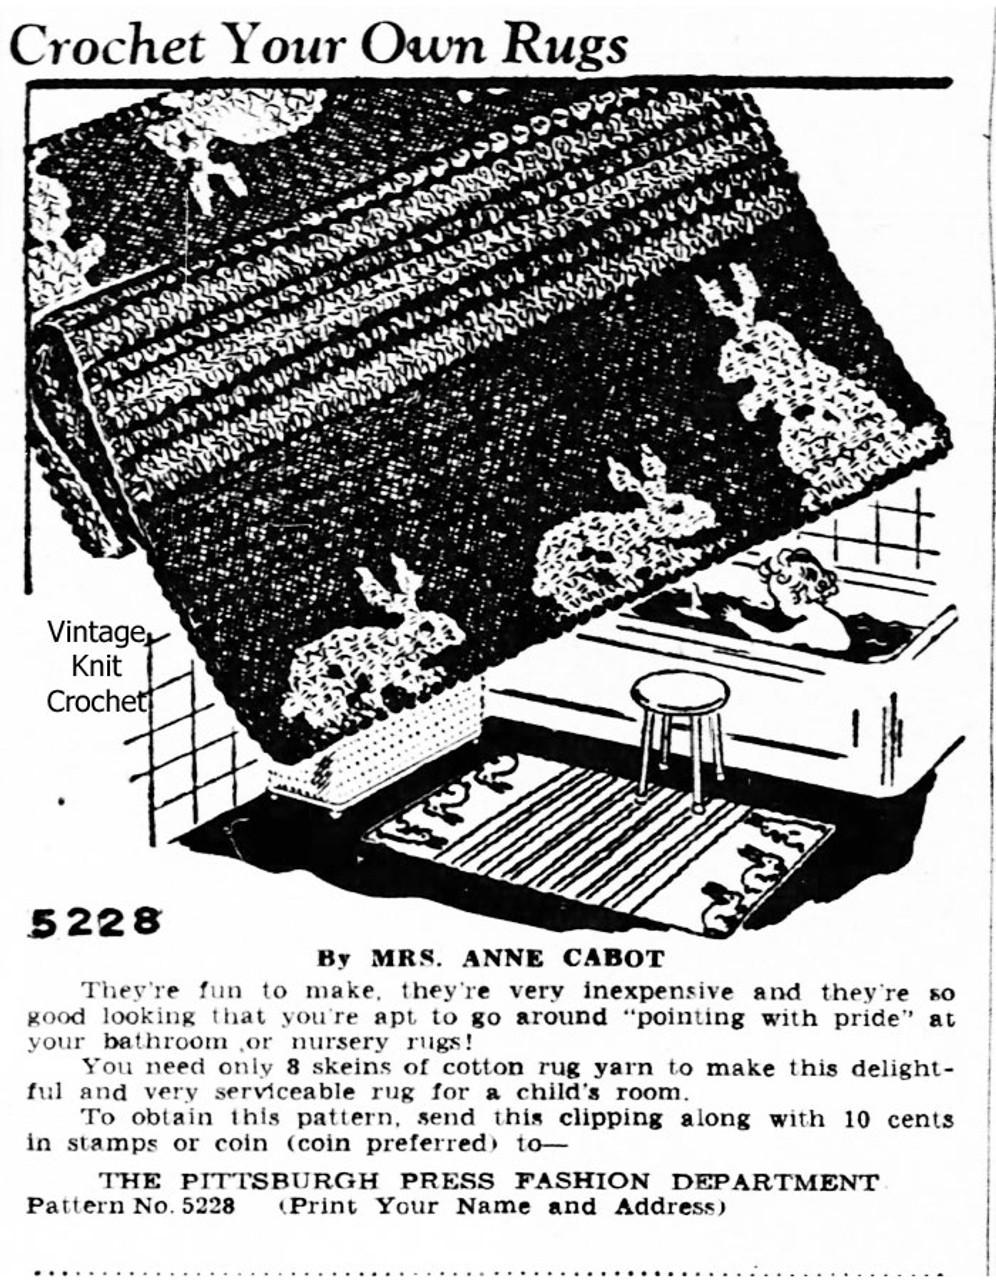 Anne Cabot Crochet Bunny Rug Pattern Advertisement